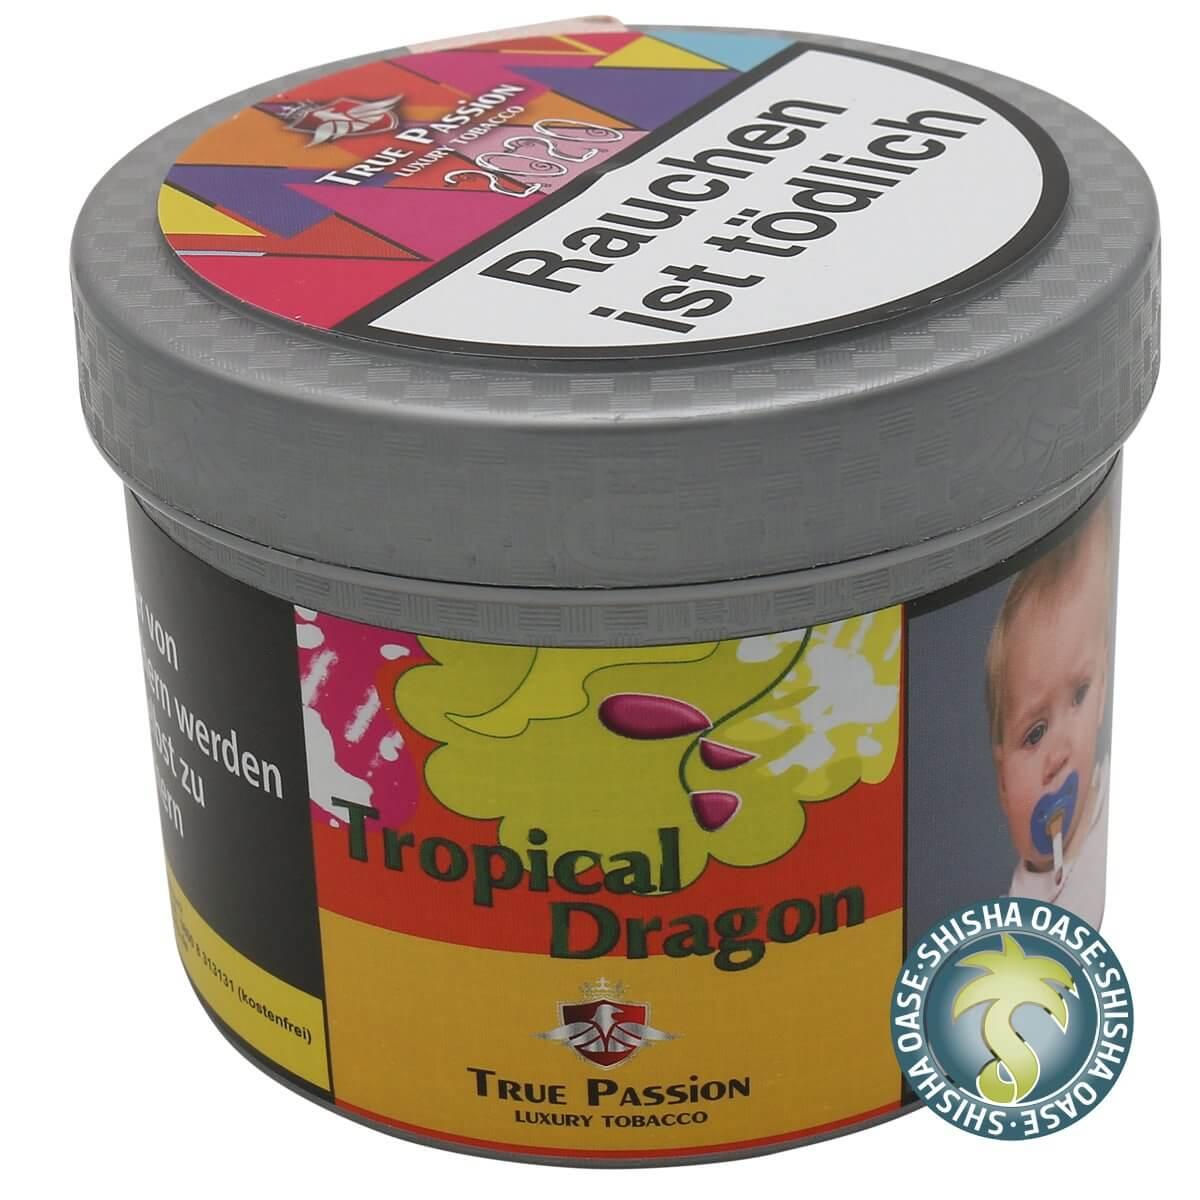 True Passion Tabak 200g Dose | Tropical Dragon